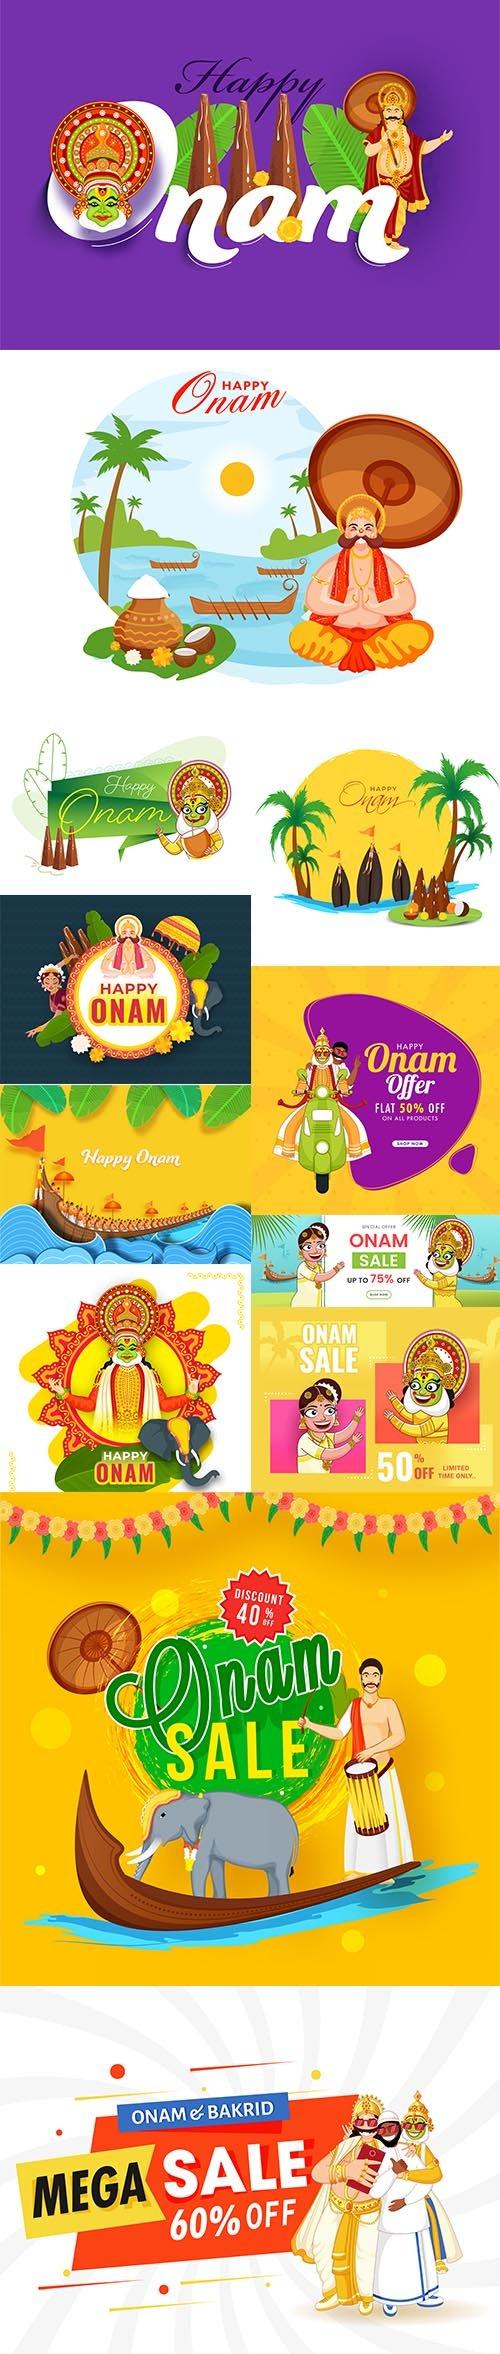 Happy Onam Concept Illustration